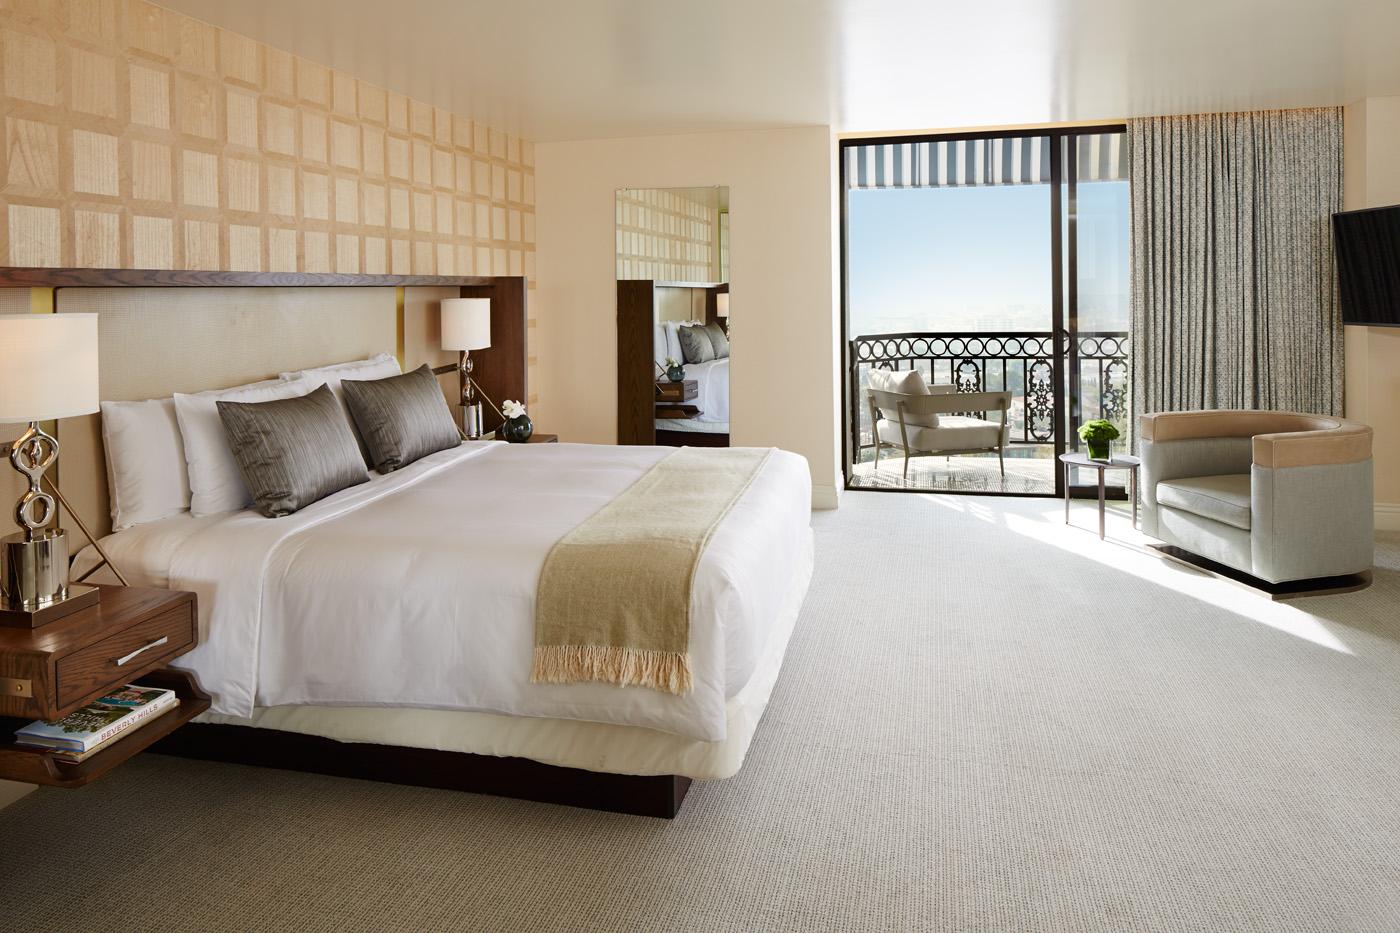 room design, décor master bedroom 10 David Collins Master Bedroom Ideas 160118 LWH suite904 bedroom noslippers 494